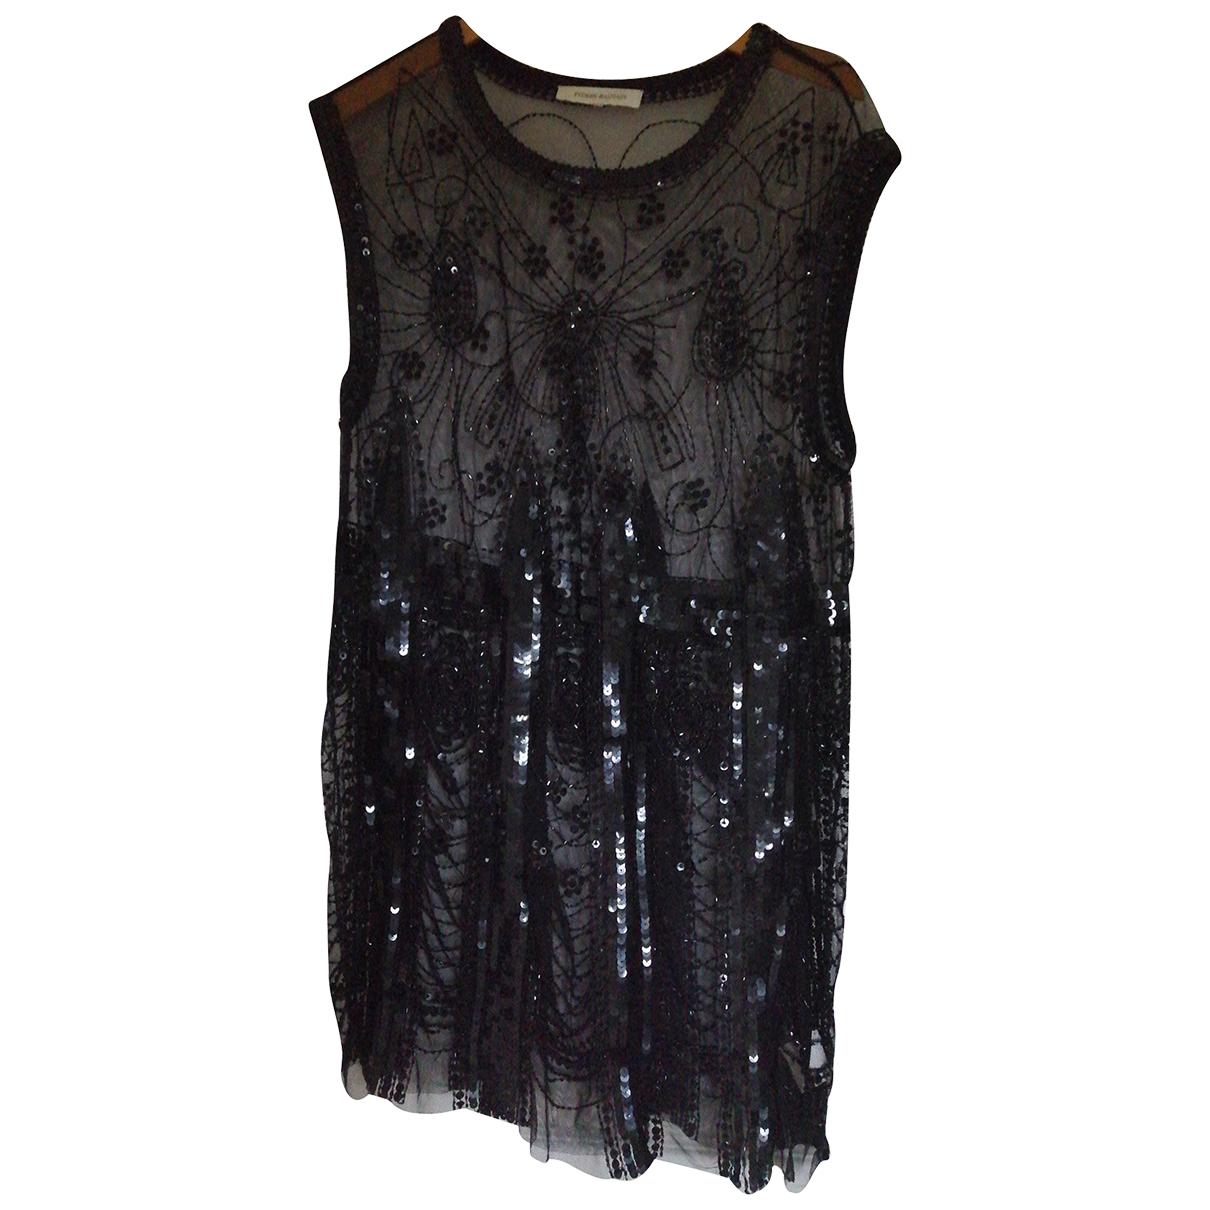 Pierre Balmain N Black Glitter dress for Women 36 FR